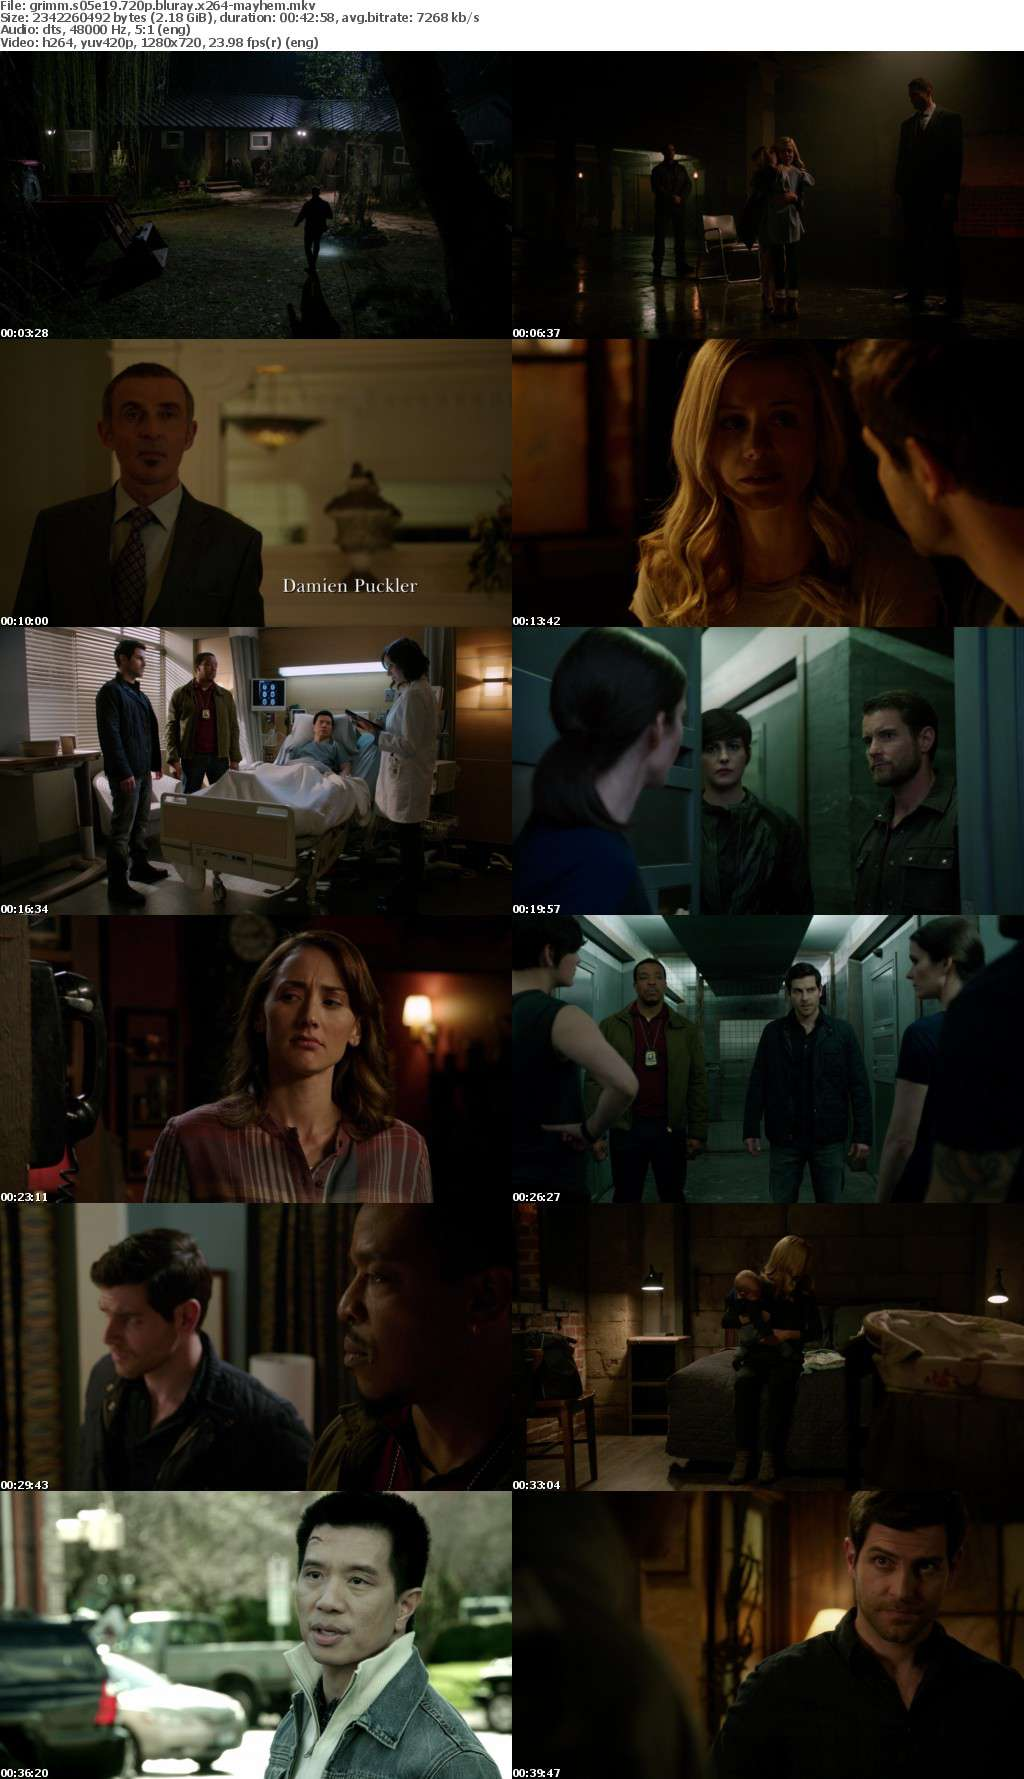 Grimm S05E19 720p BluRay x264-MAYHEM